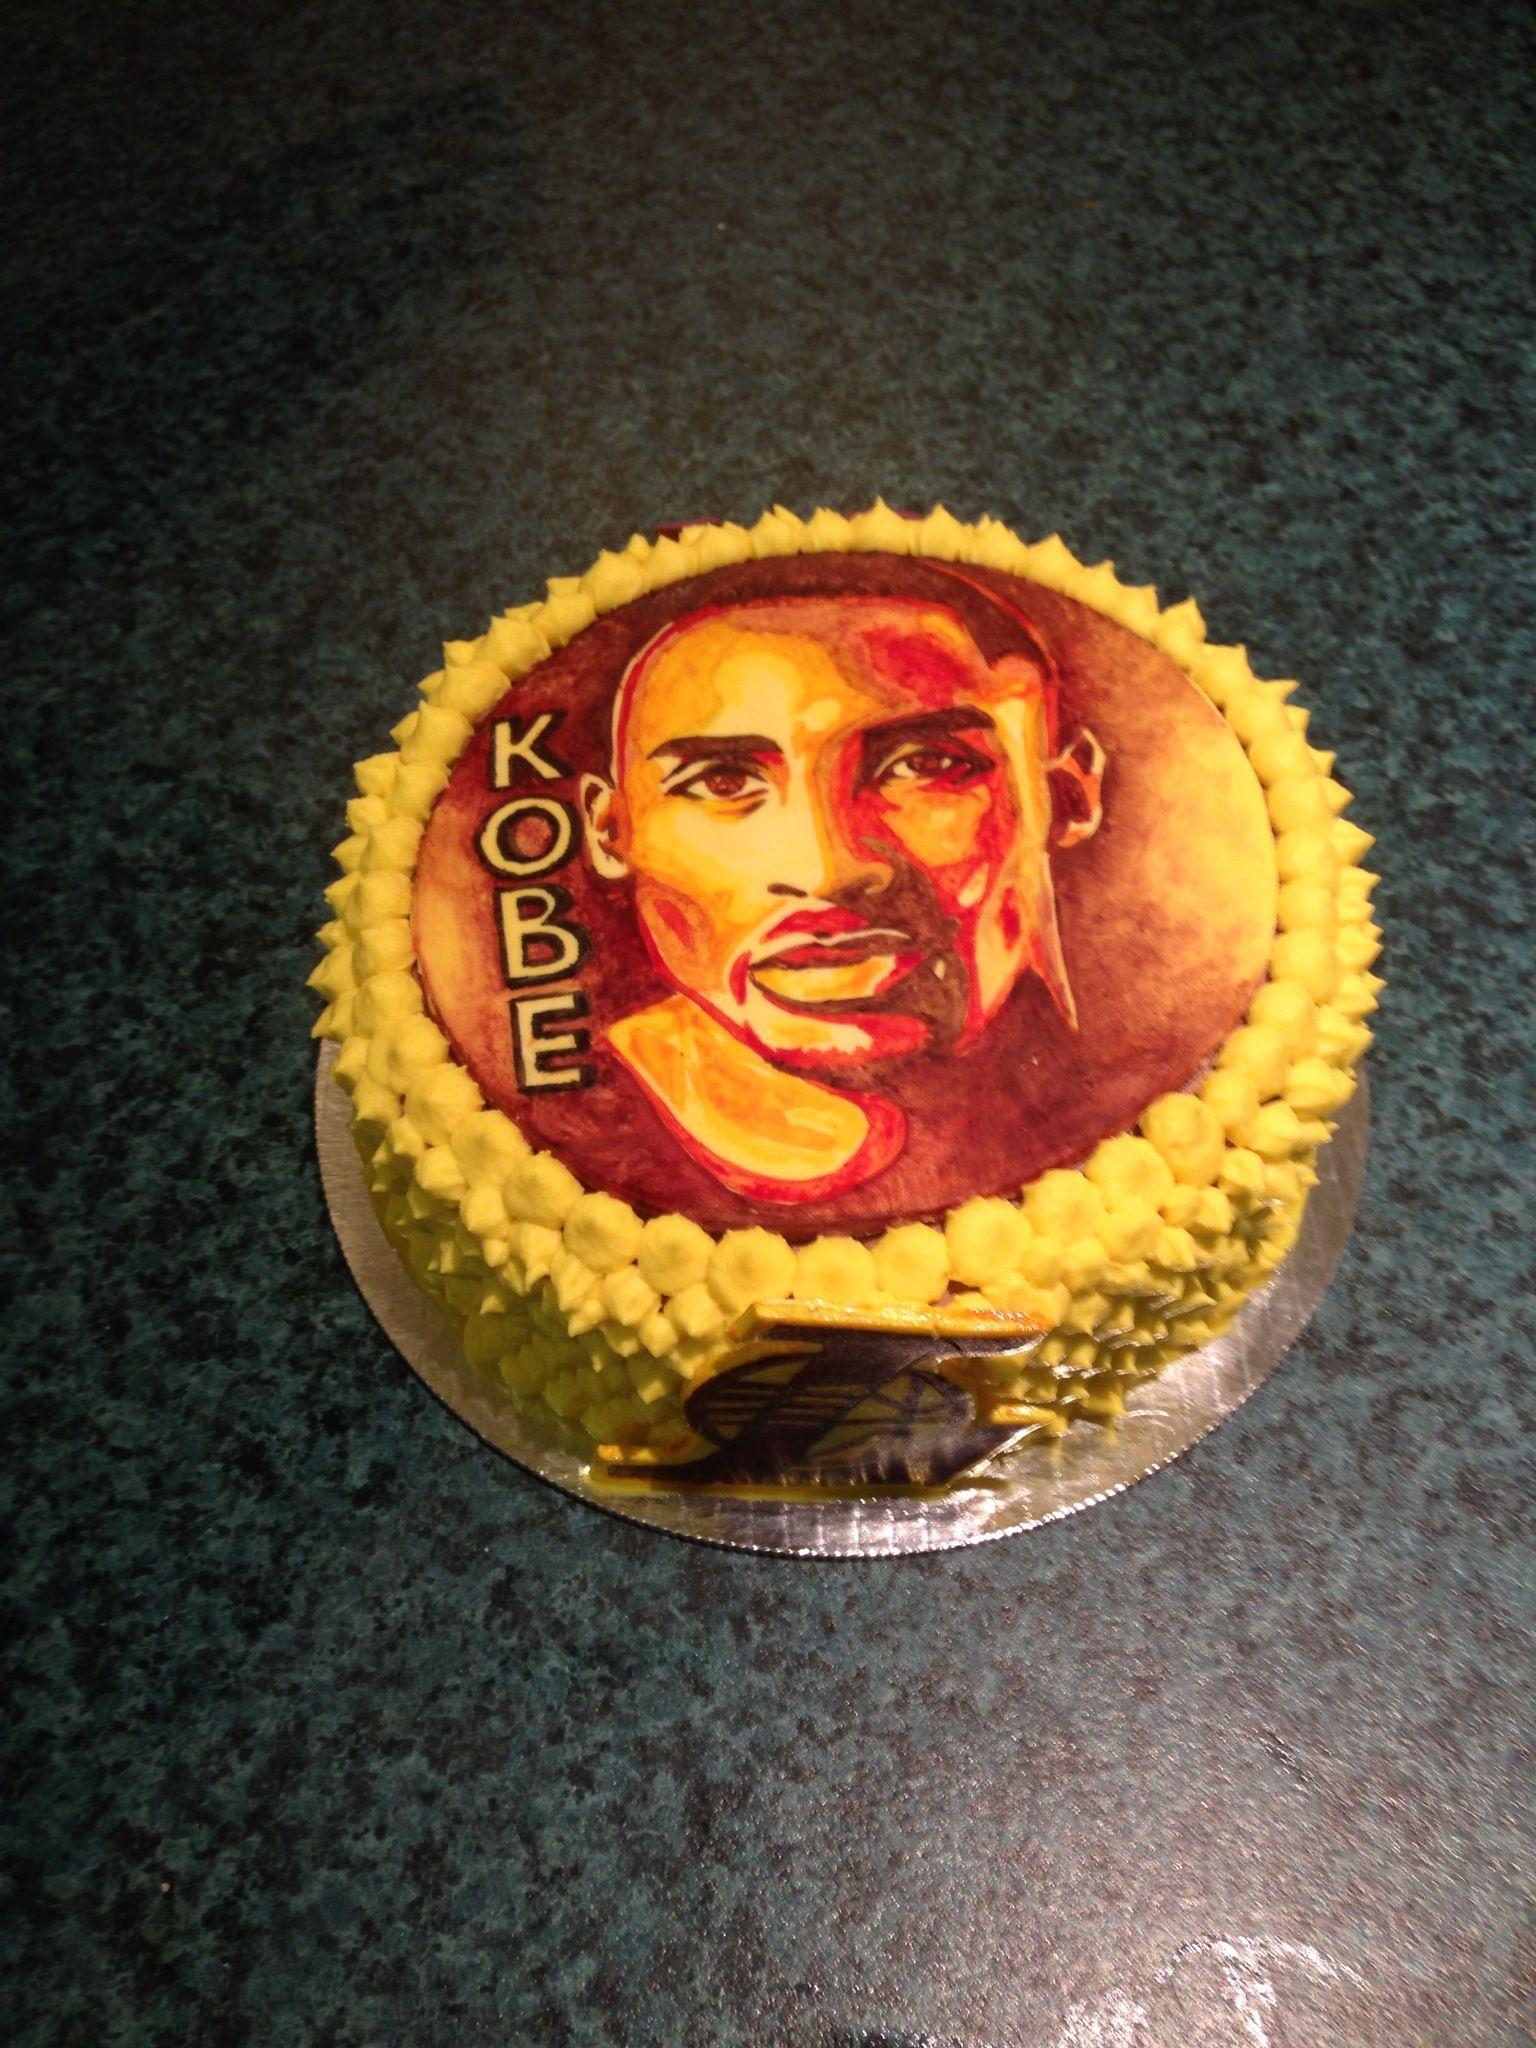 Kobe Bryant cake Cake, Kobe, Kobe bryant